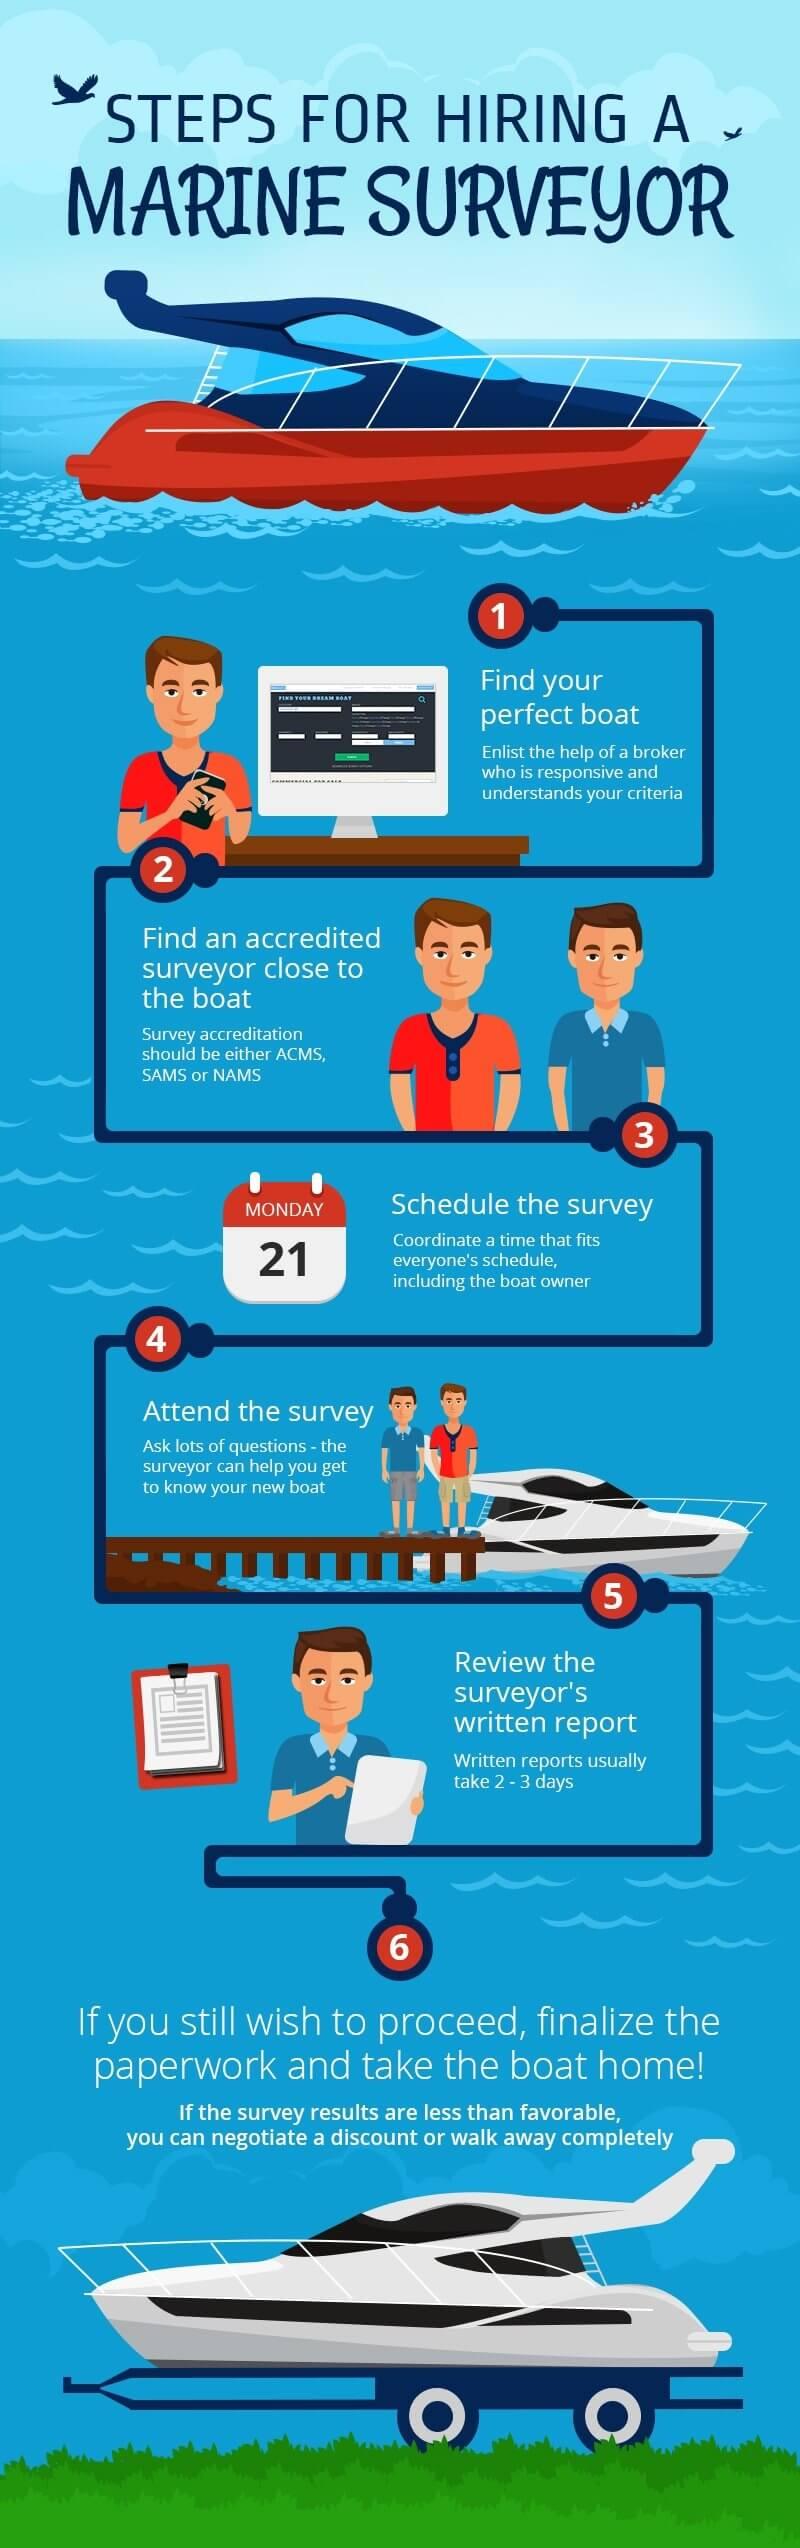 Steps for Hiring a Boat Surveyor